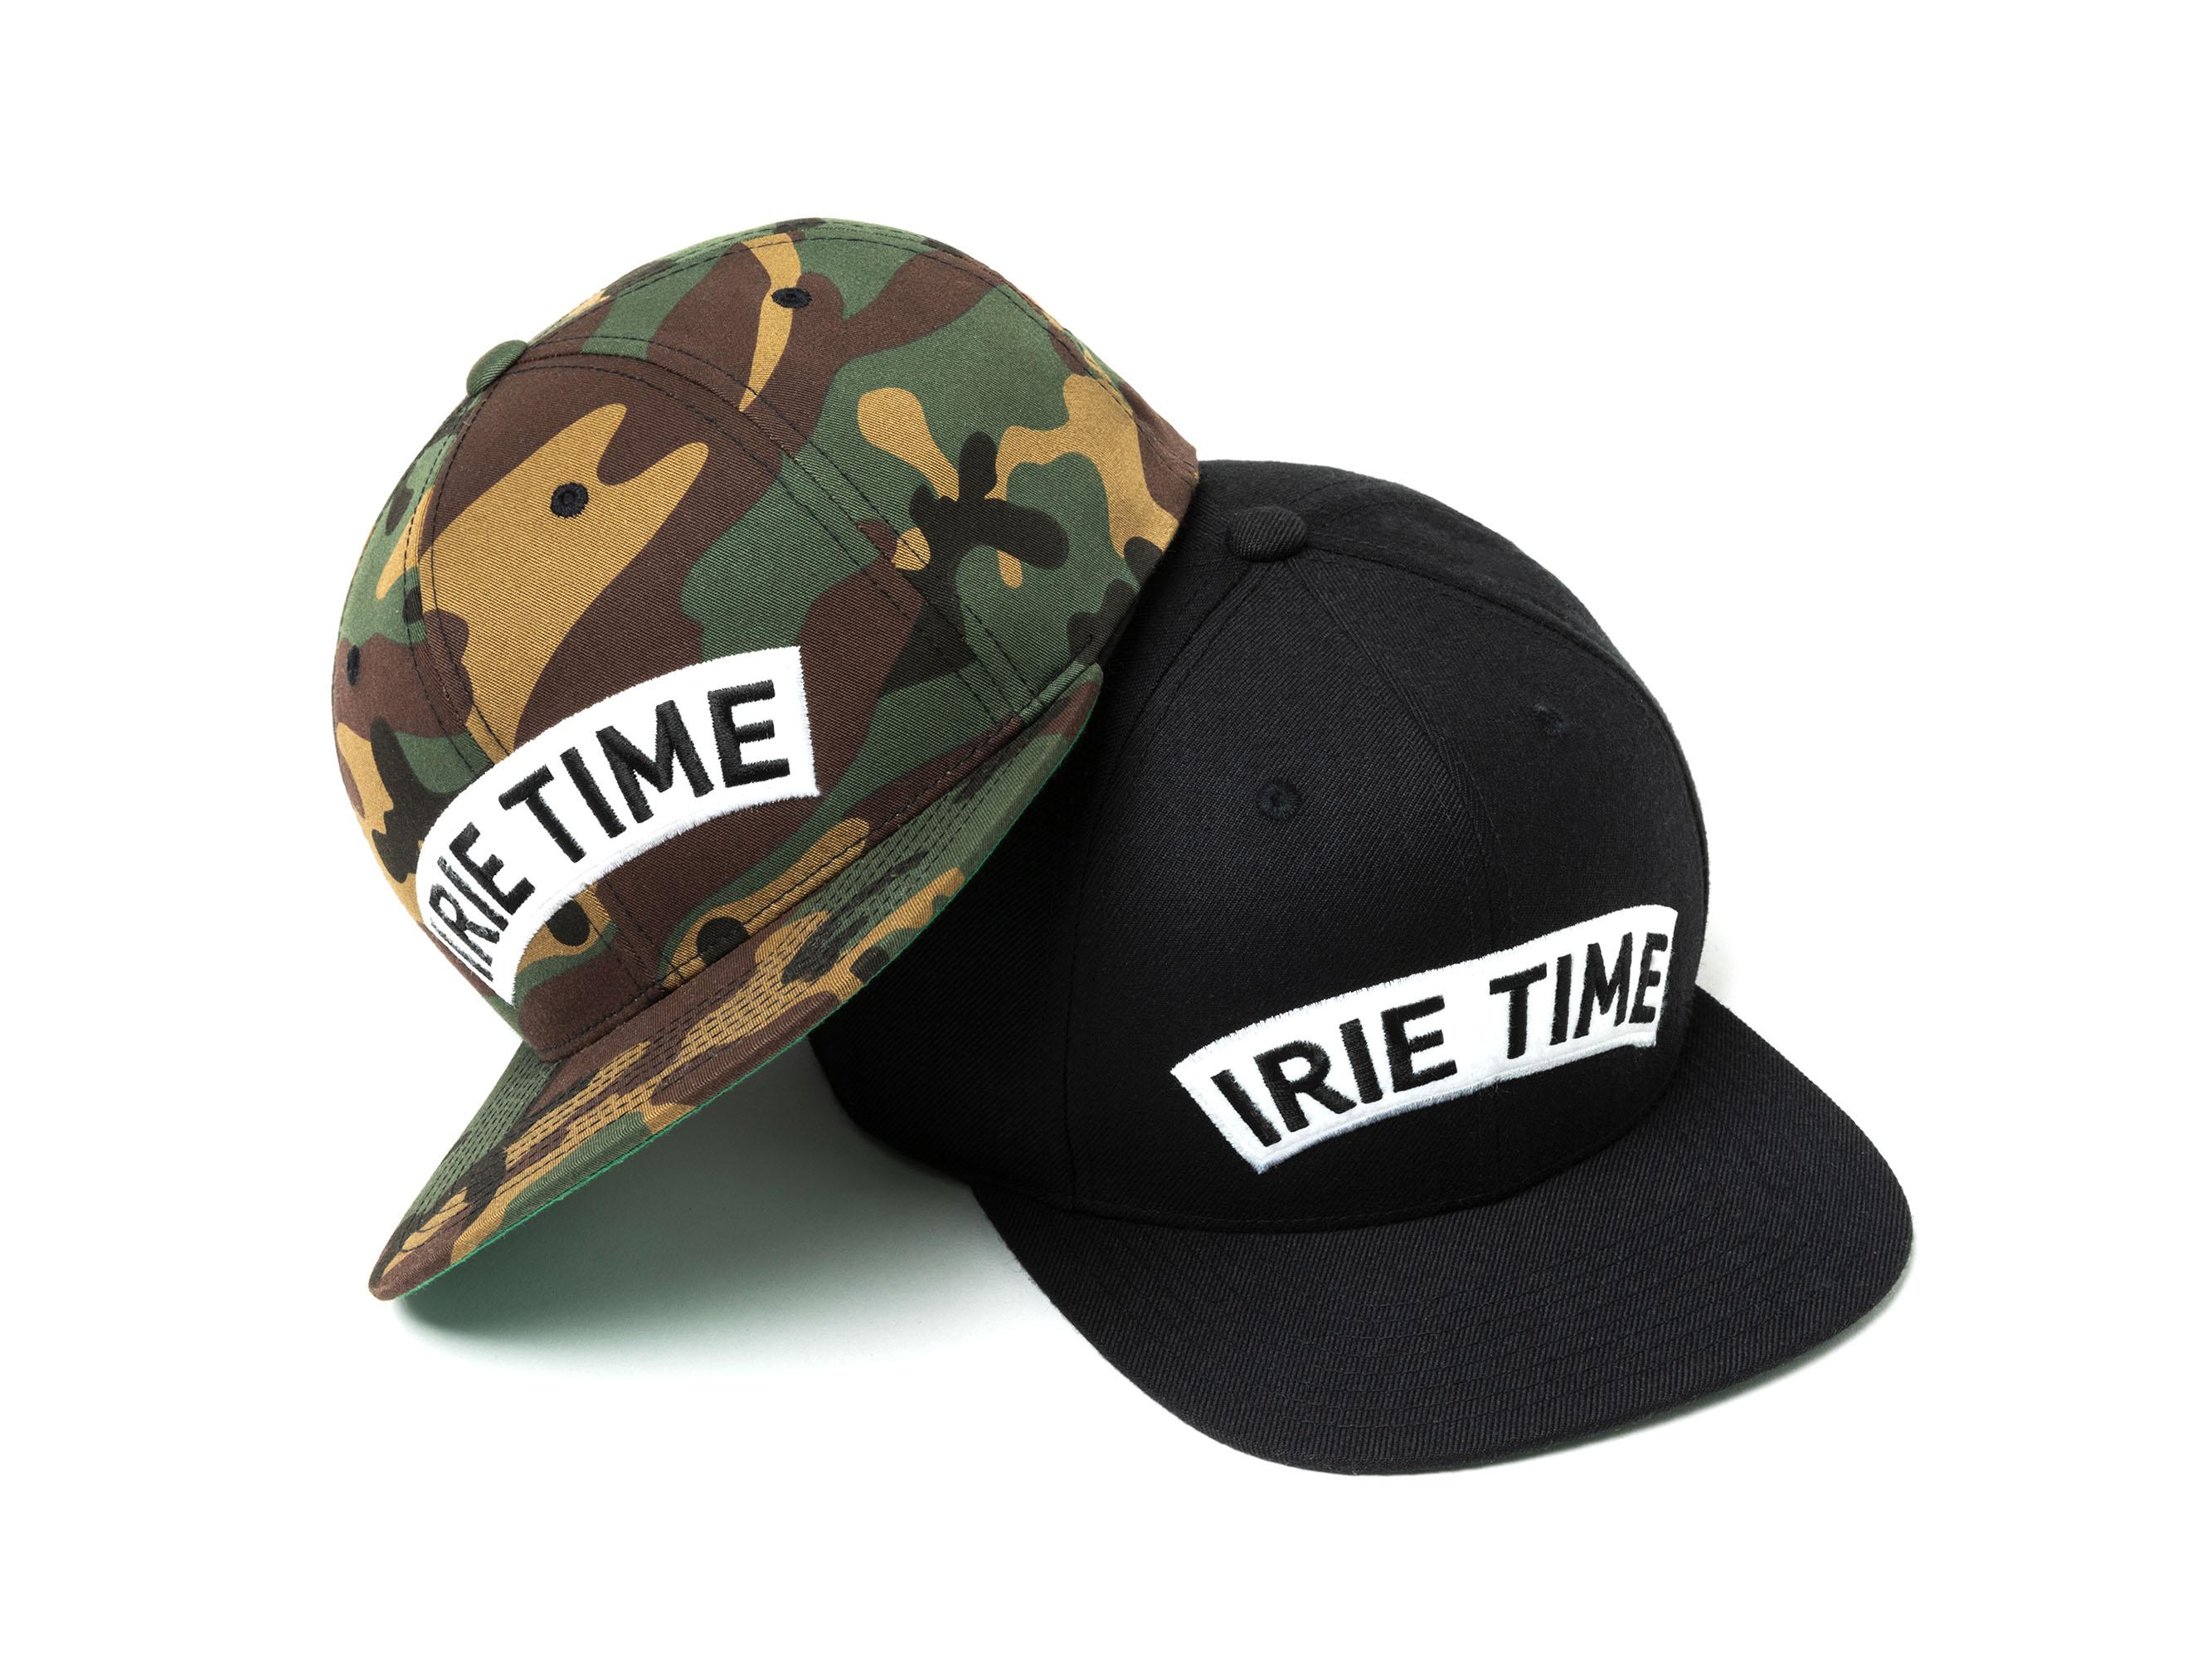 IRIE TIME CAP - IRIE by irielife